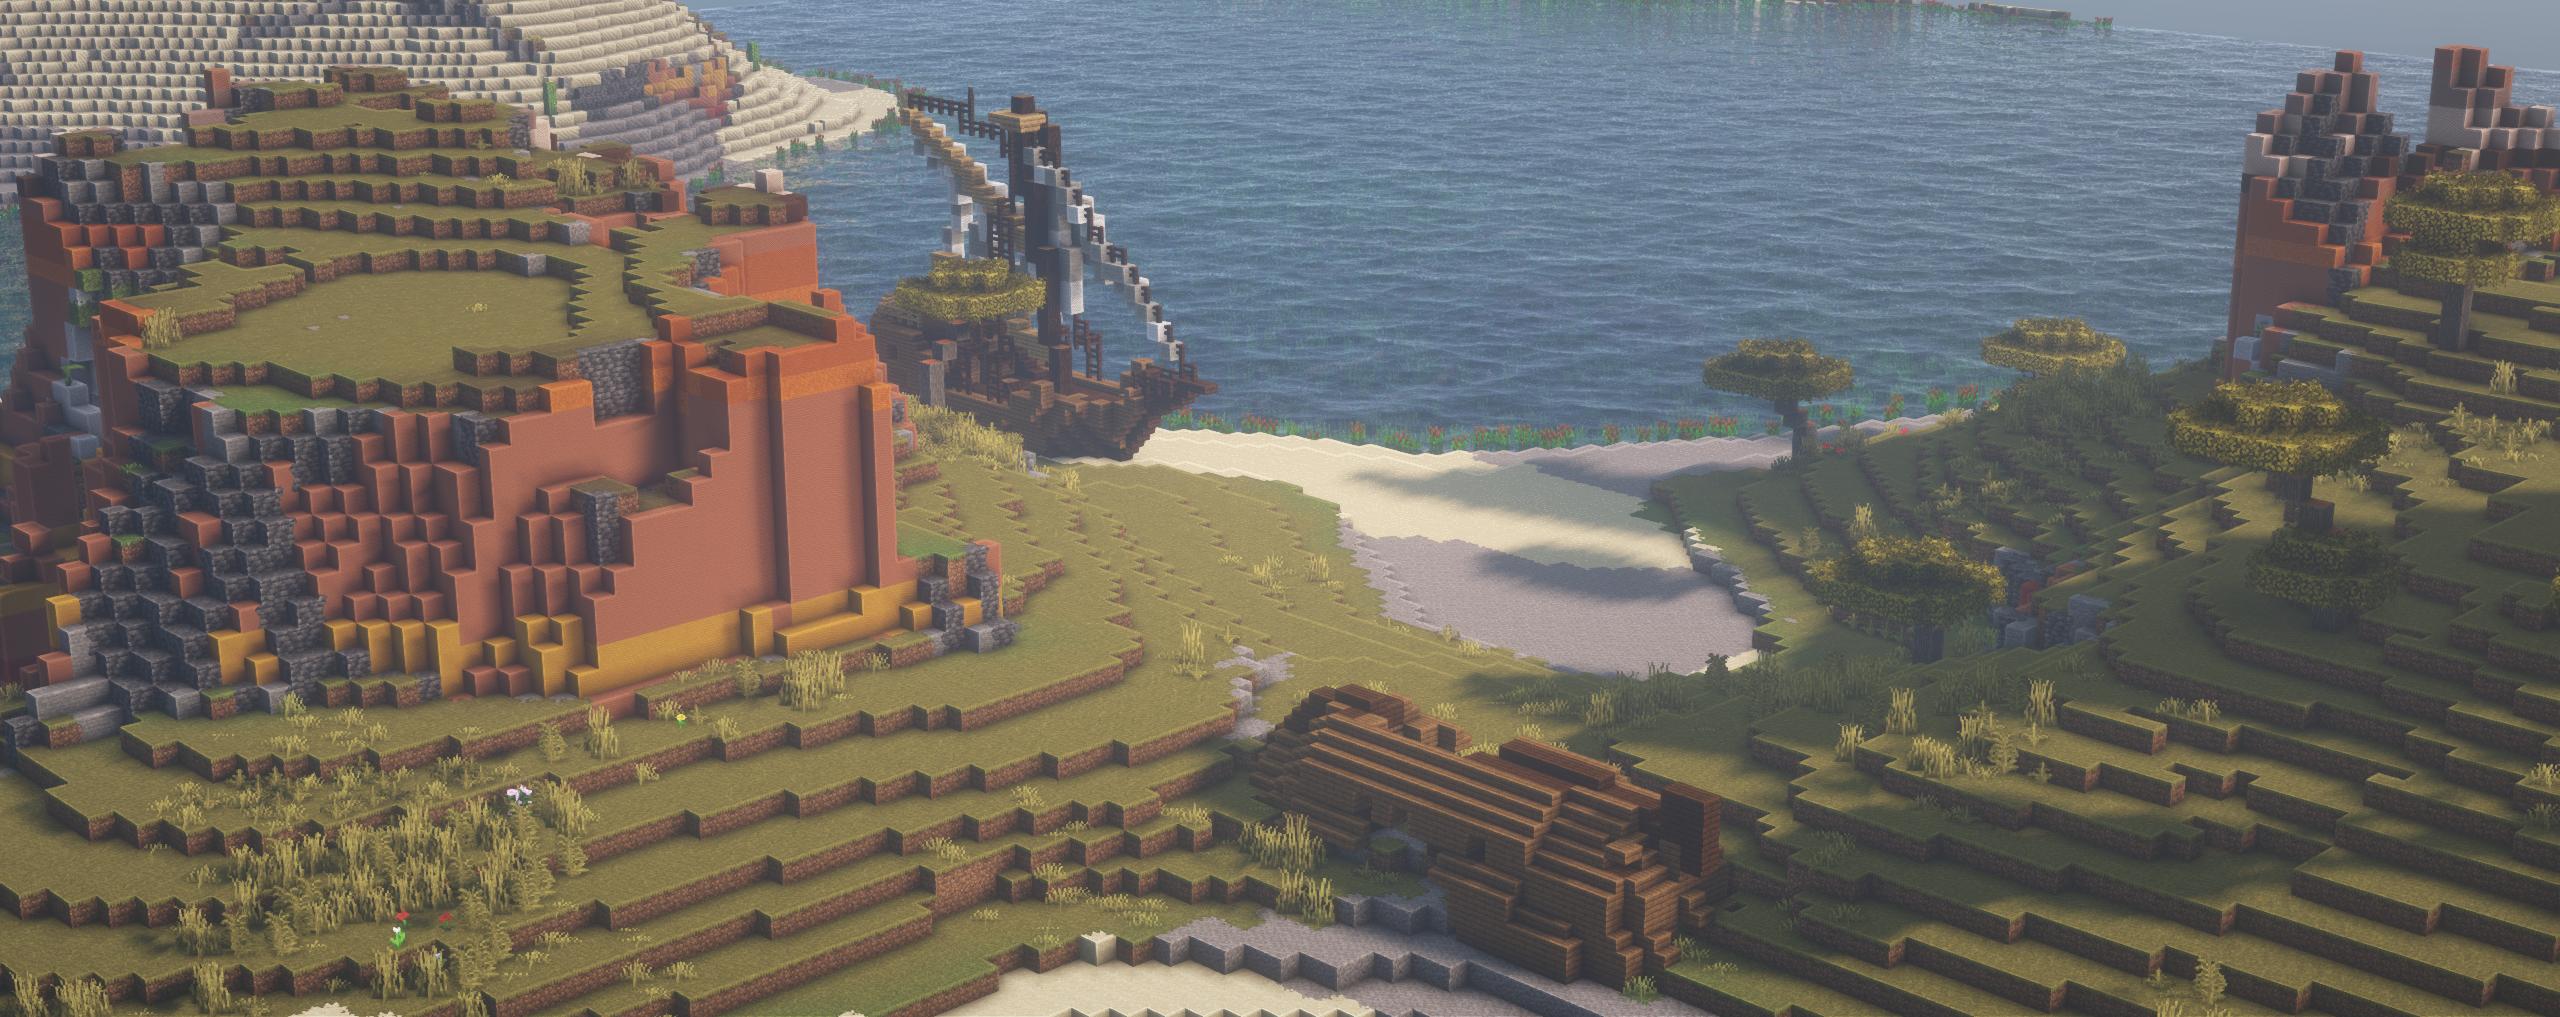 1.17 Minecraft World Tour - Season 1 - Part 1 - #Gerohall on [play.mcmeddon.com]